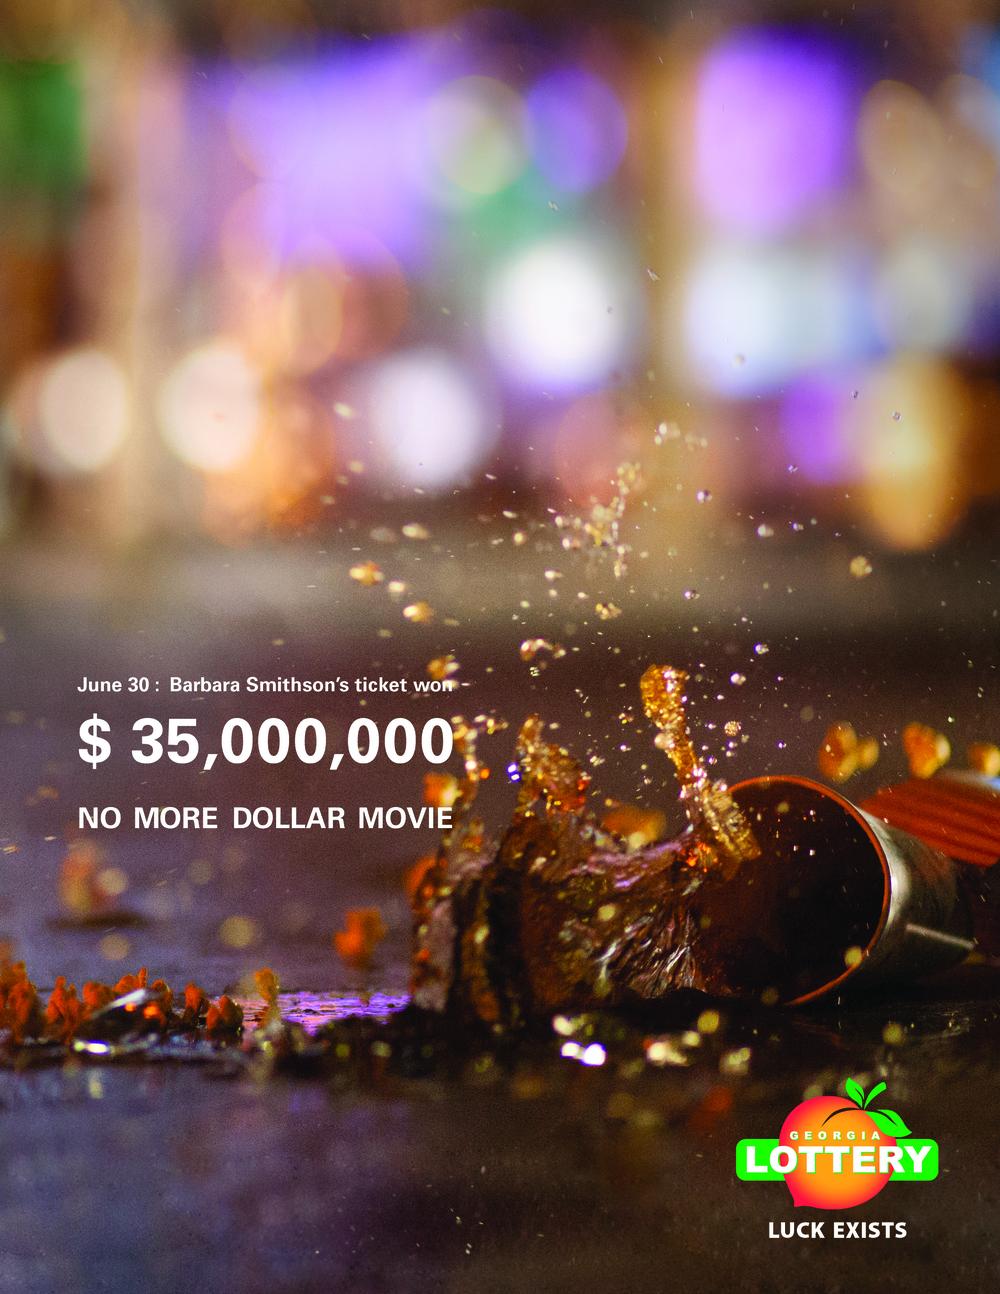 GA-Lottery-Final-CS54.jpg